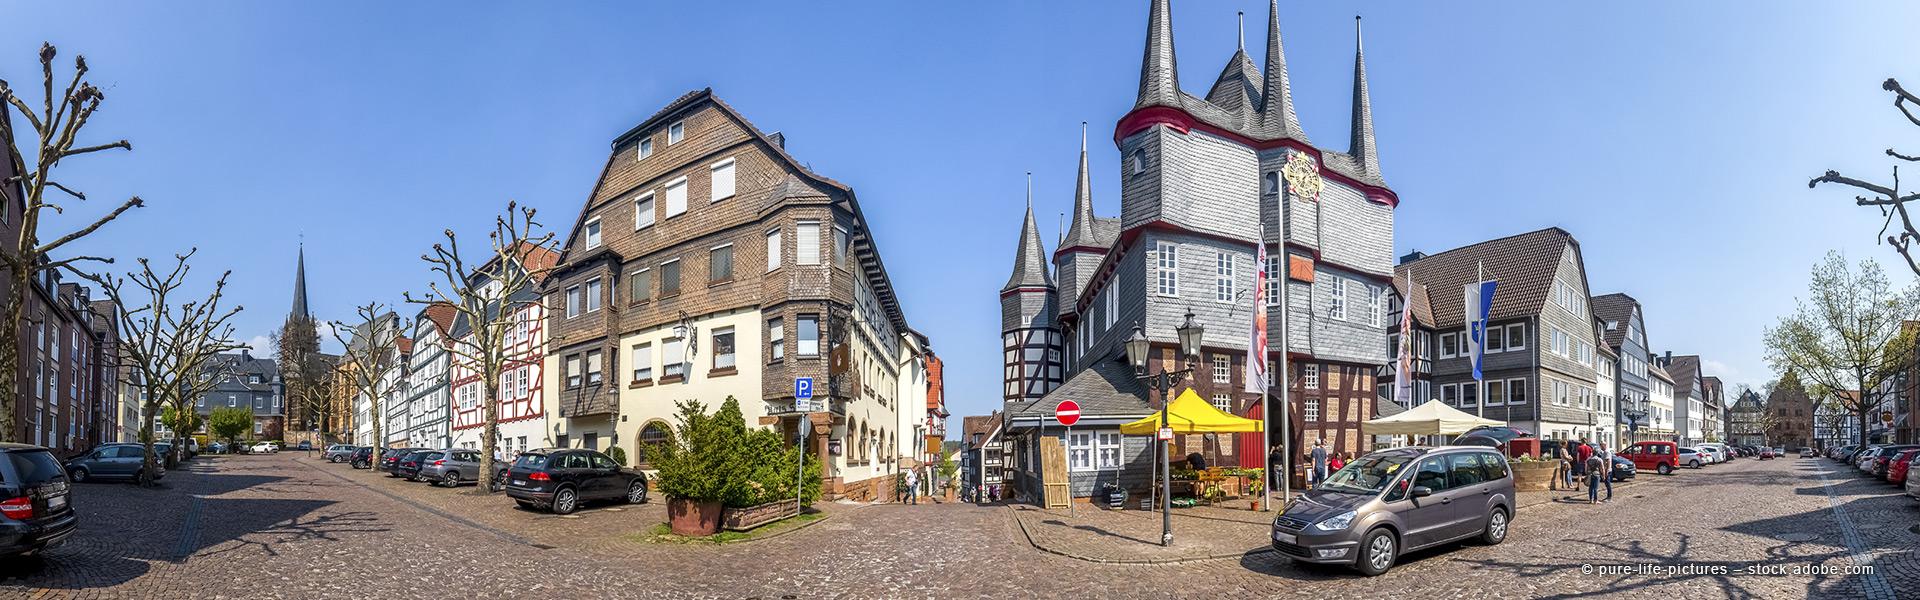 Ederbergland - wanderkompass.de